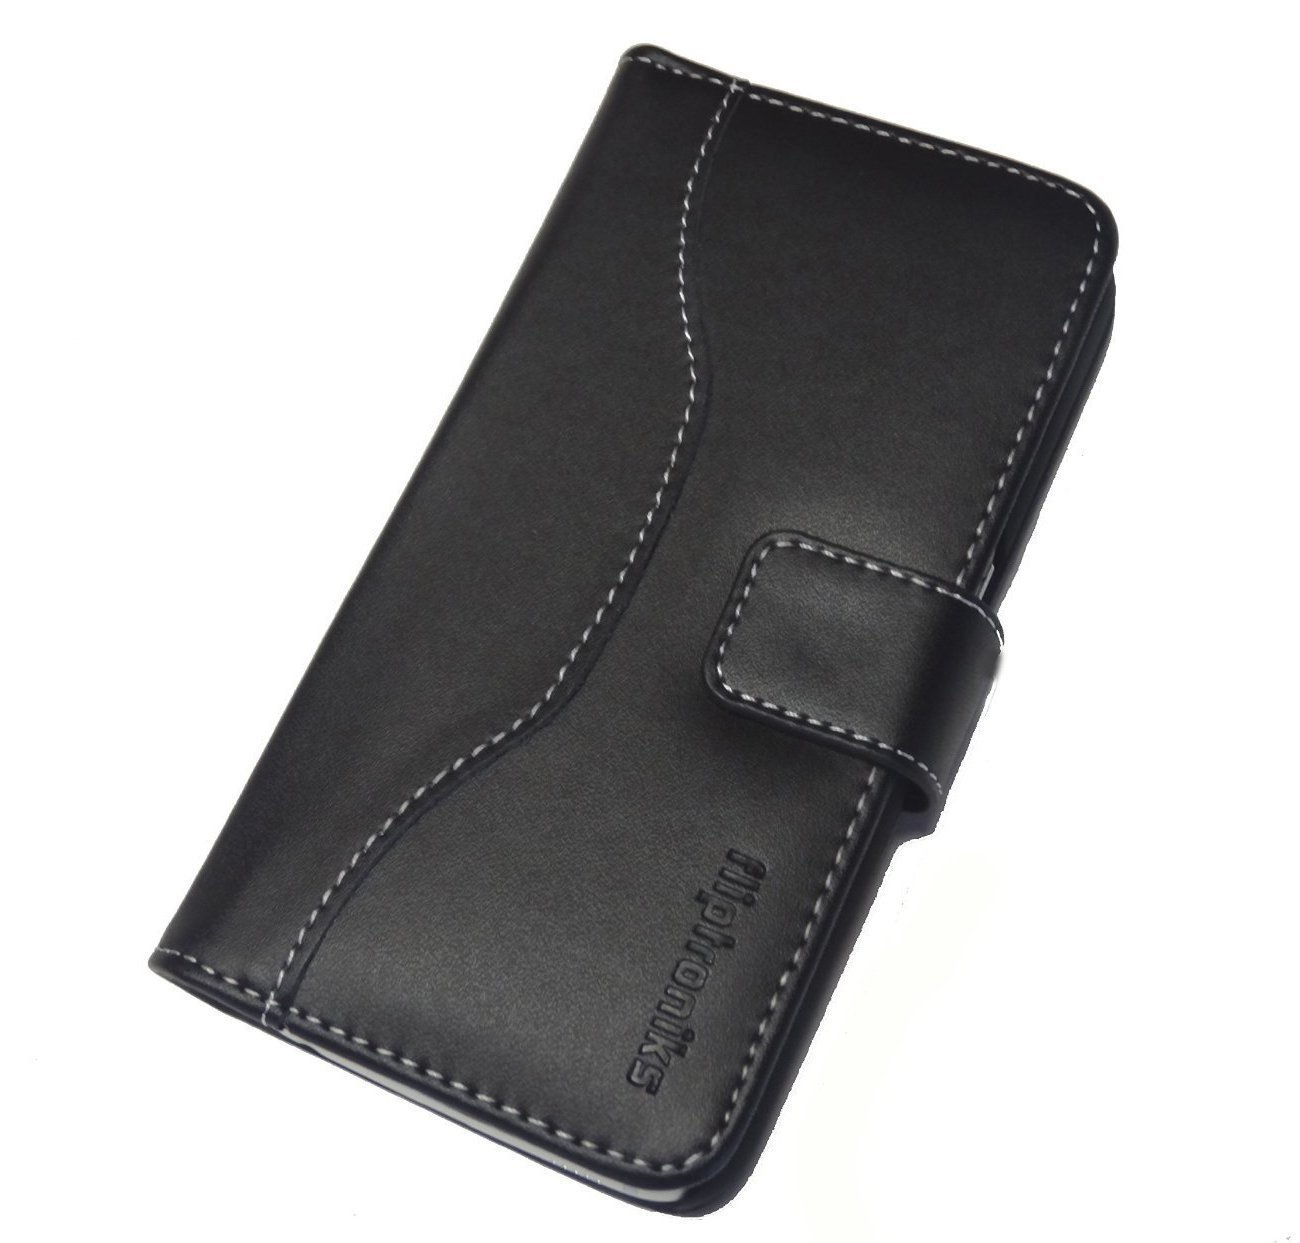 Fliptroniks Galaxy Note 4 Flip Cover